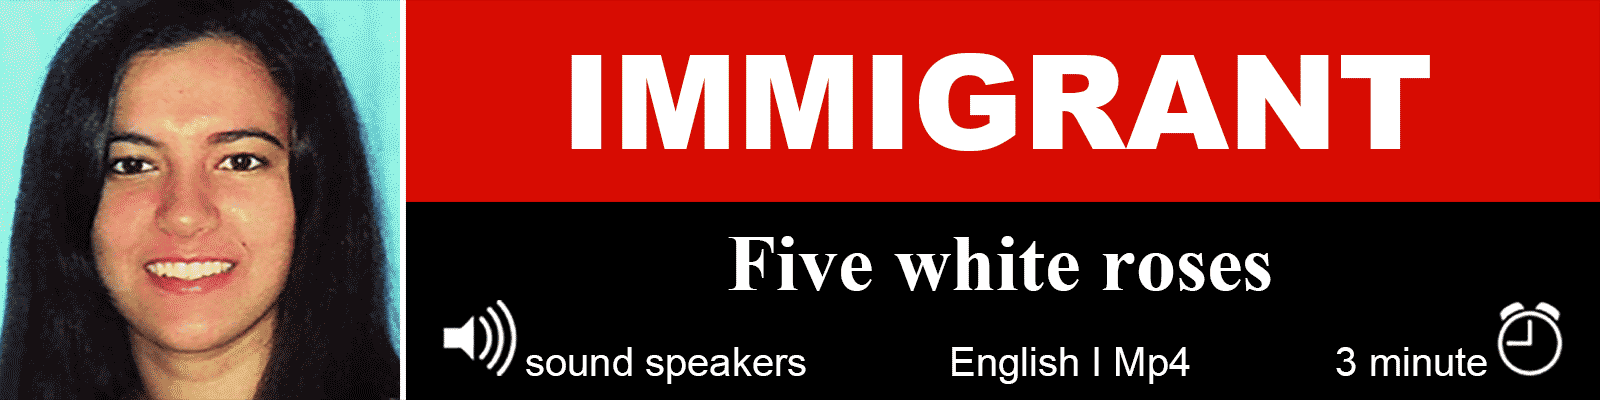 immigrant-illegal-body